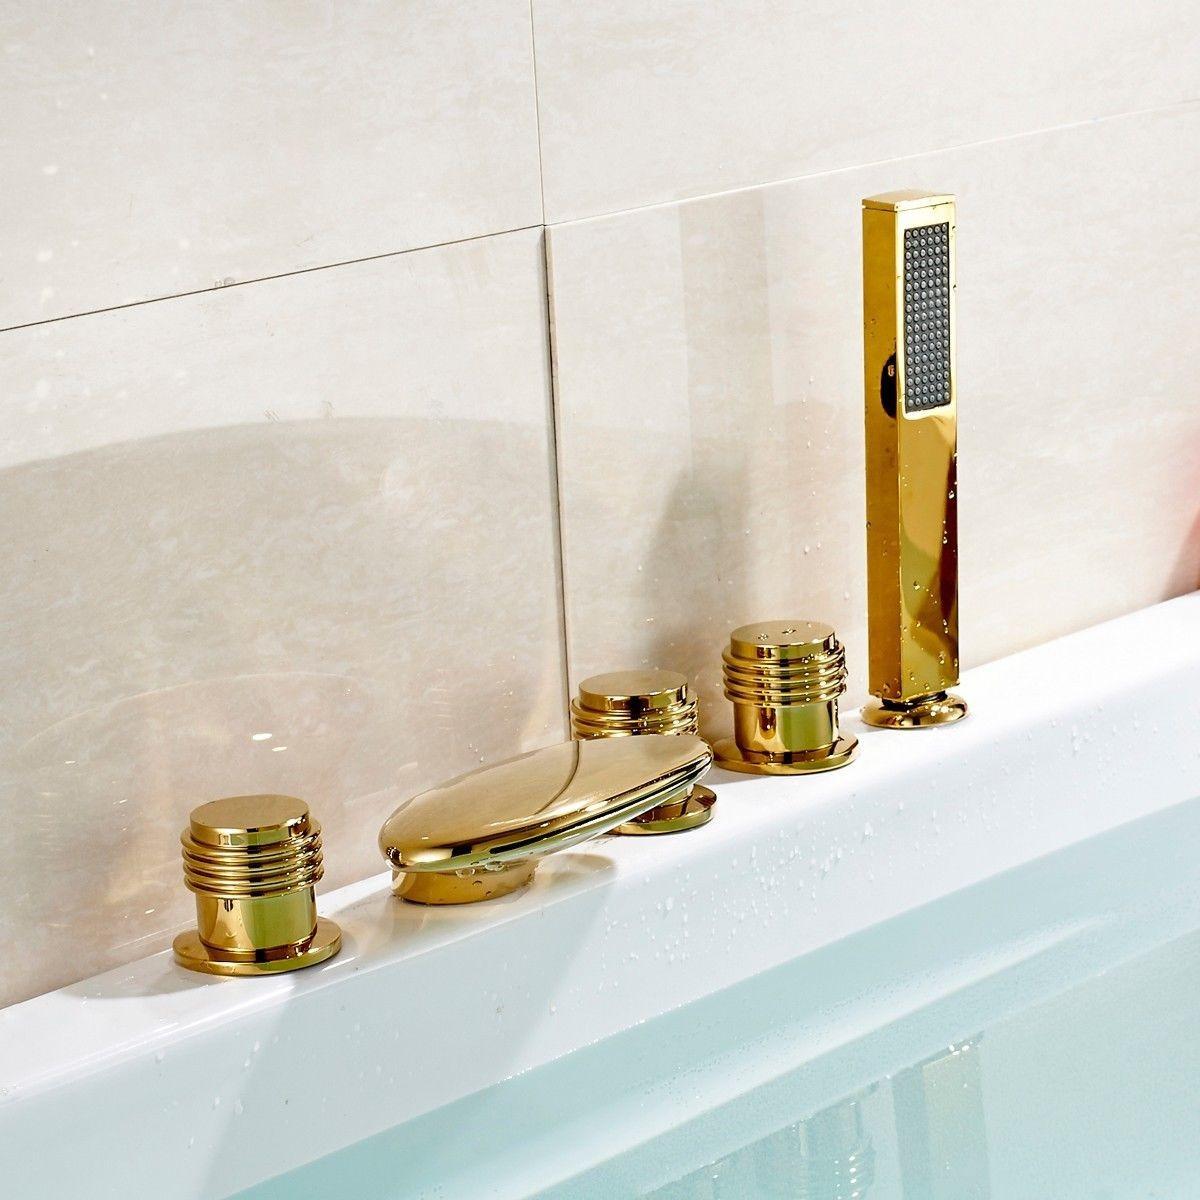 Set llaves y grifo con ducha de mano para tina de ba o d for Llaves con sensor para bano